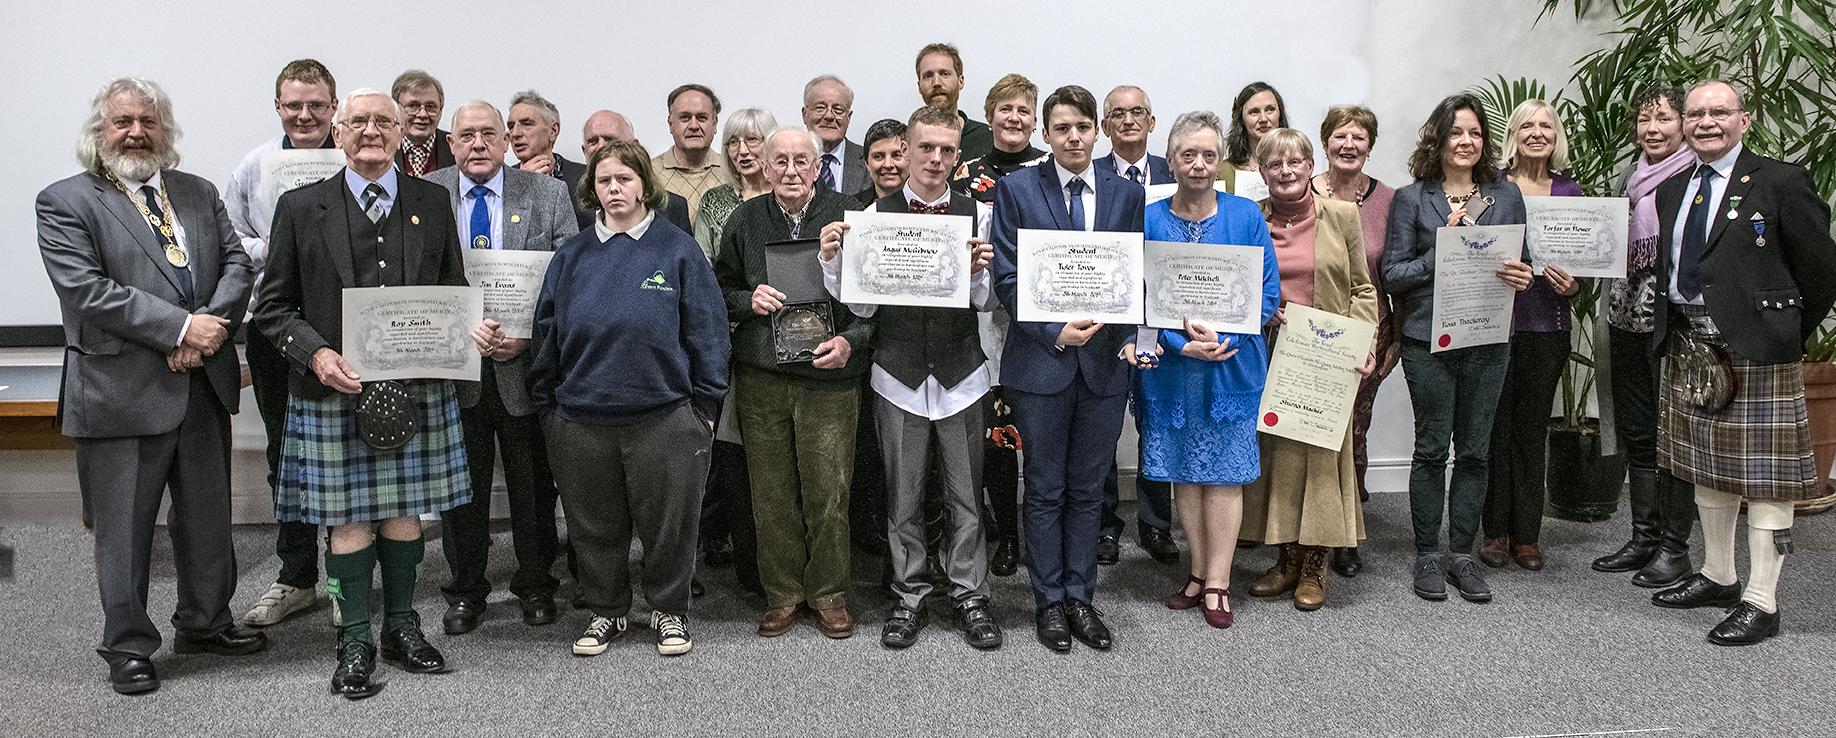 Caley Award Winners 2019